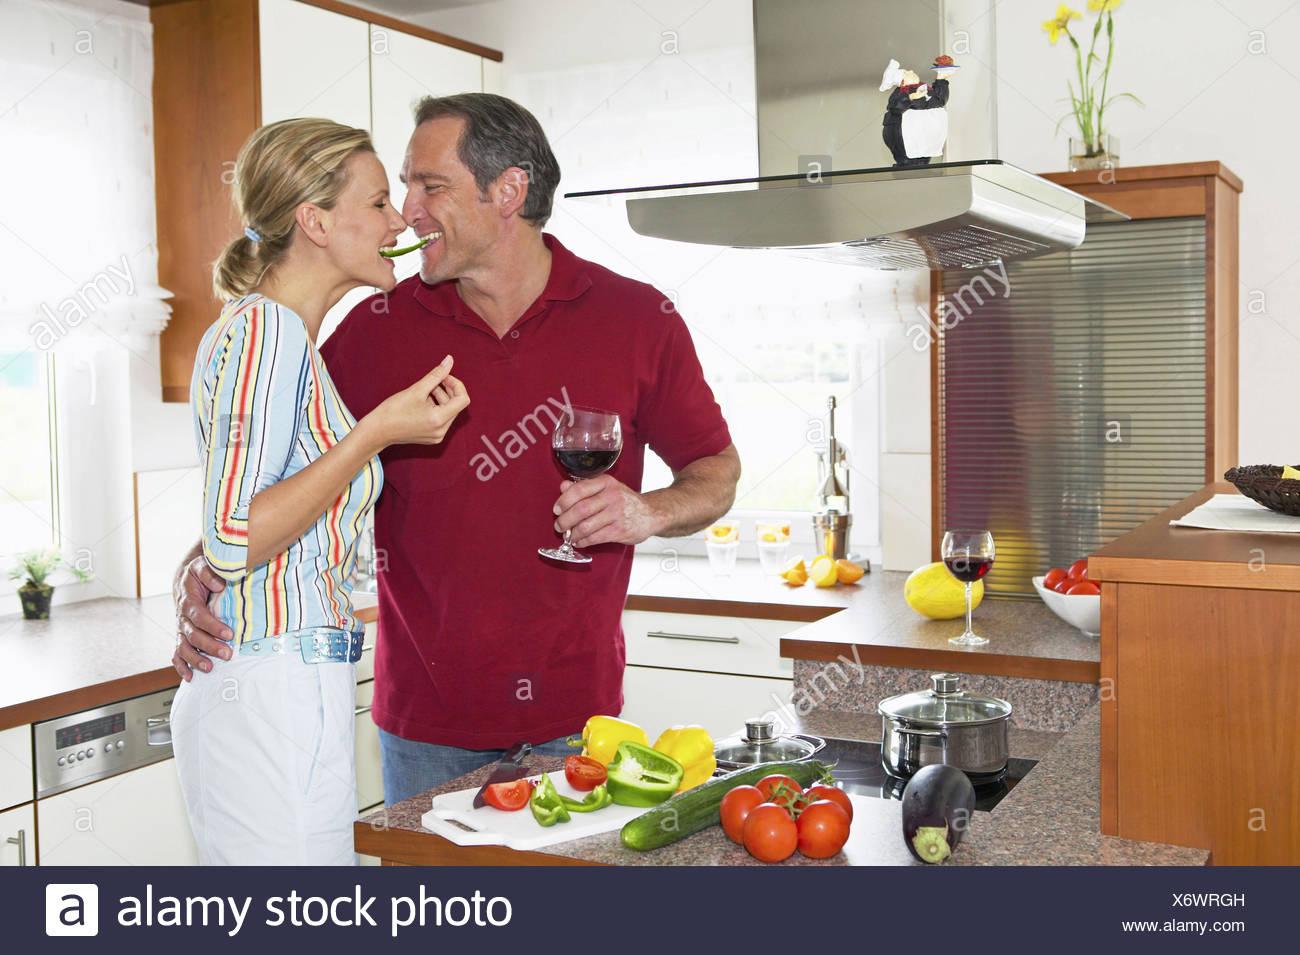 Cuisine, couple, falls in love, paprika films, eat, together, half